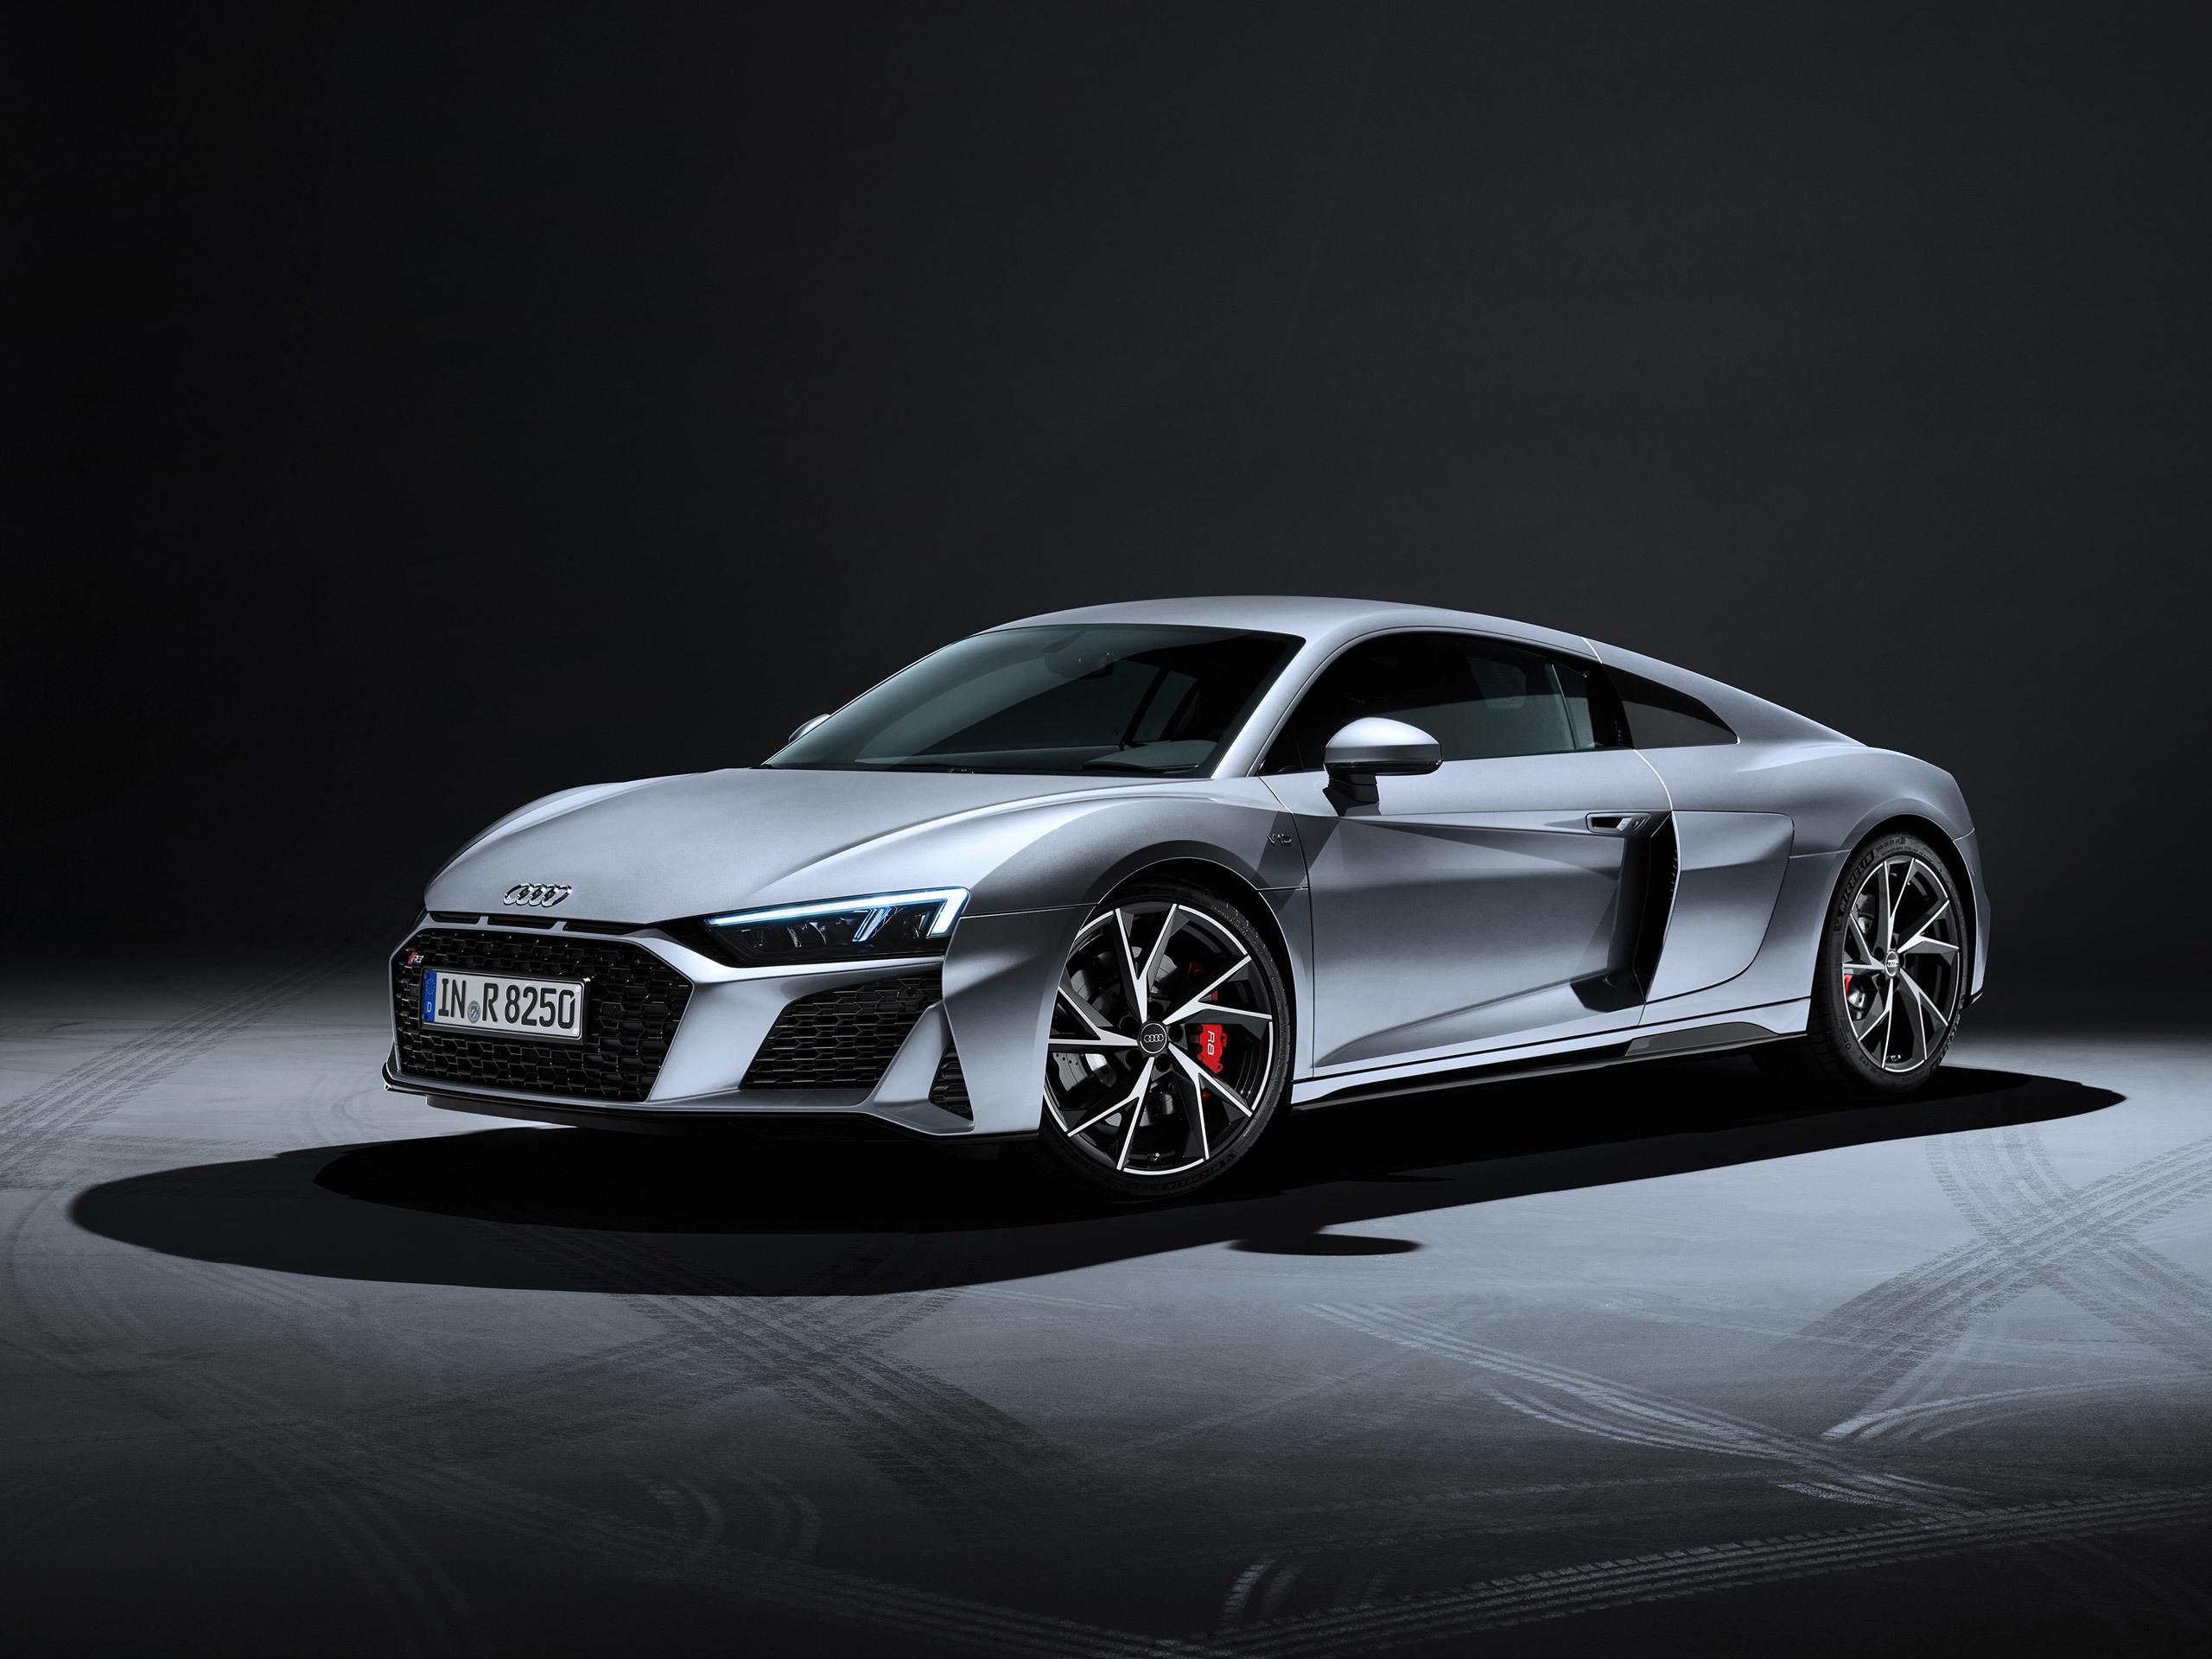 Audi R8 Coupe V10 Rwd 2020 アウディに嵌まる 壁紙画像ブログ